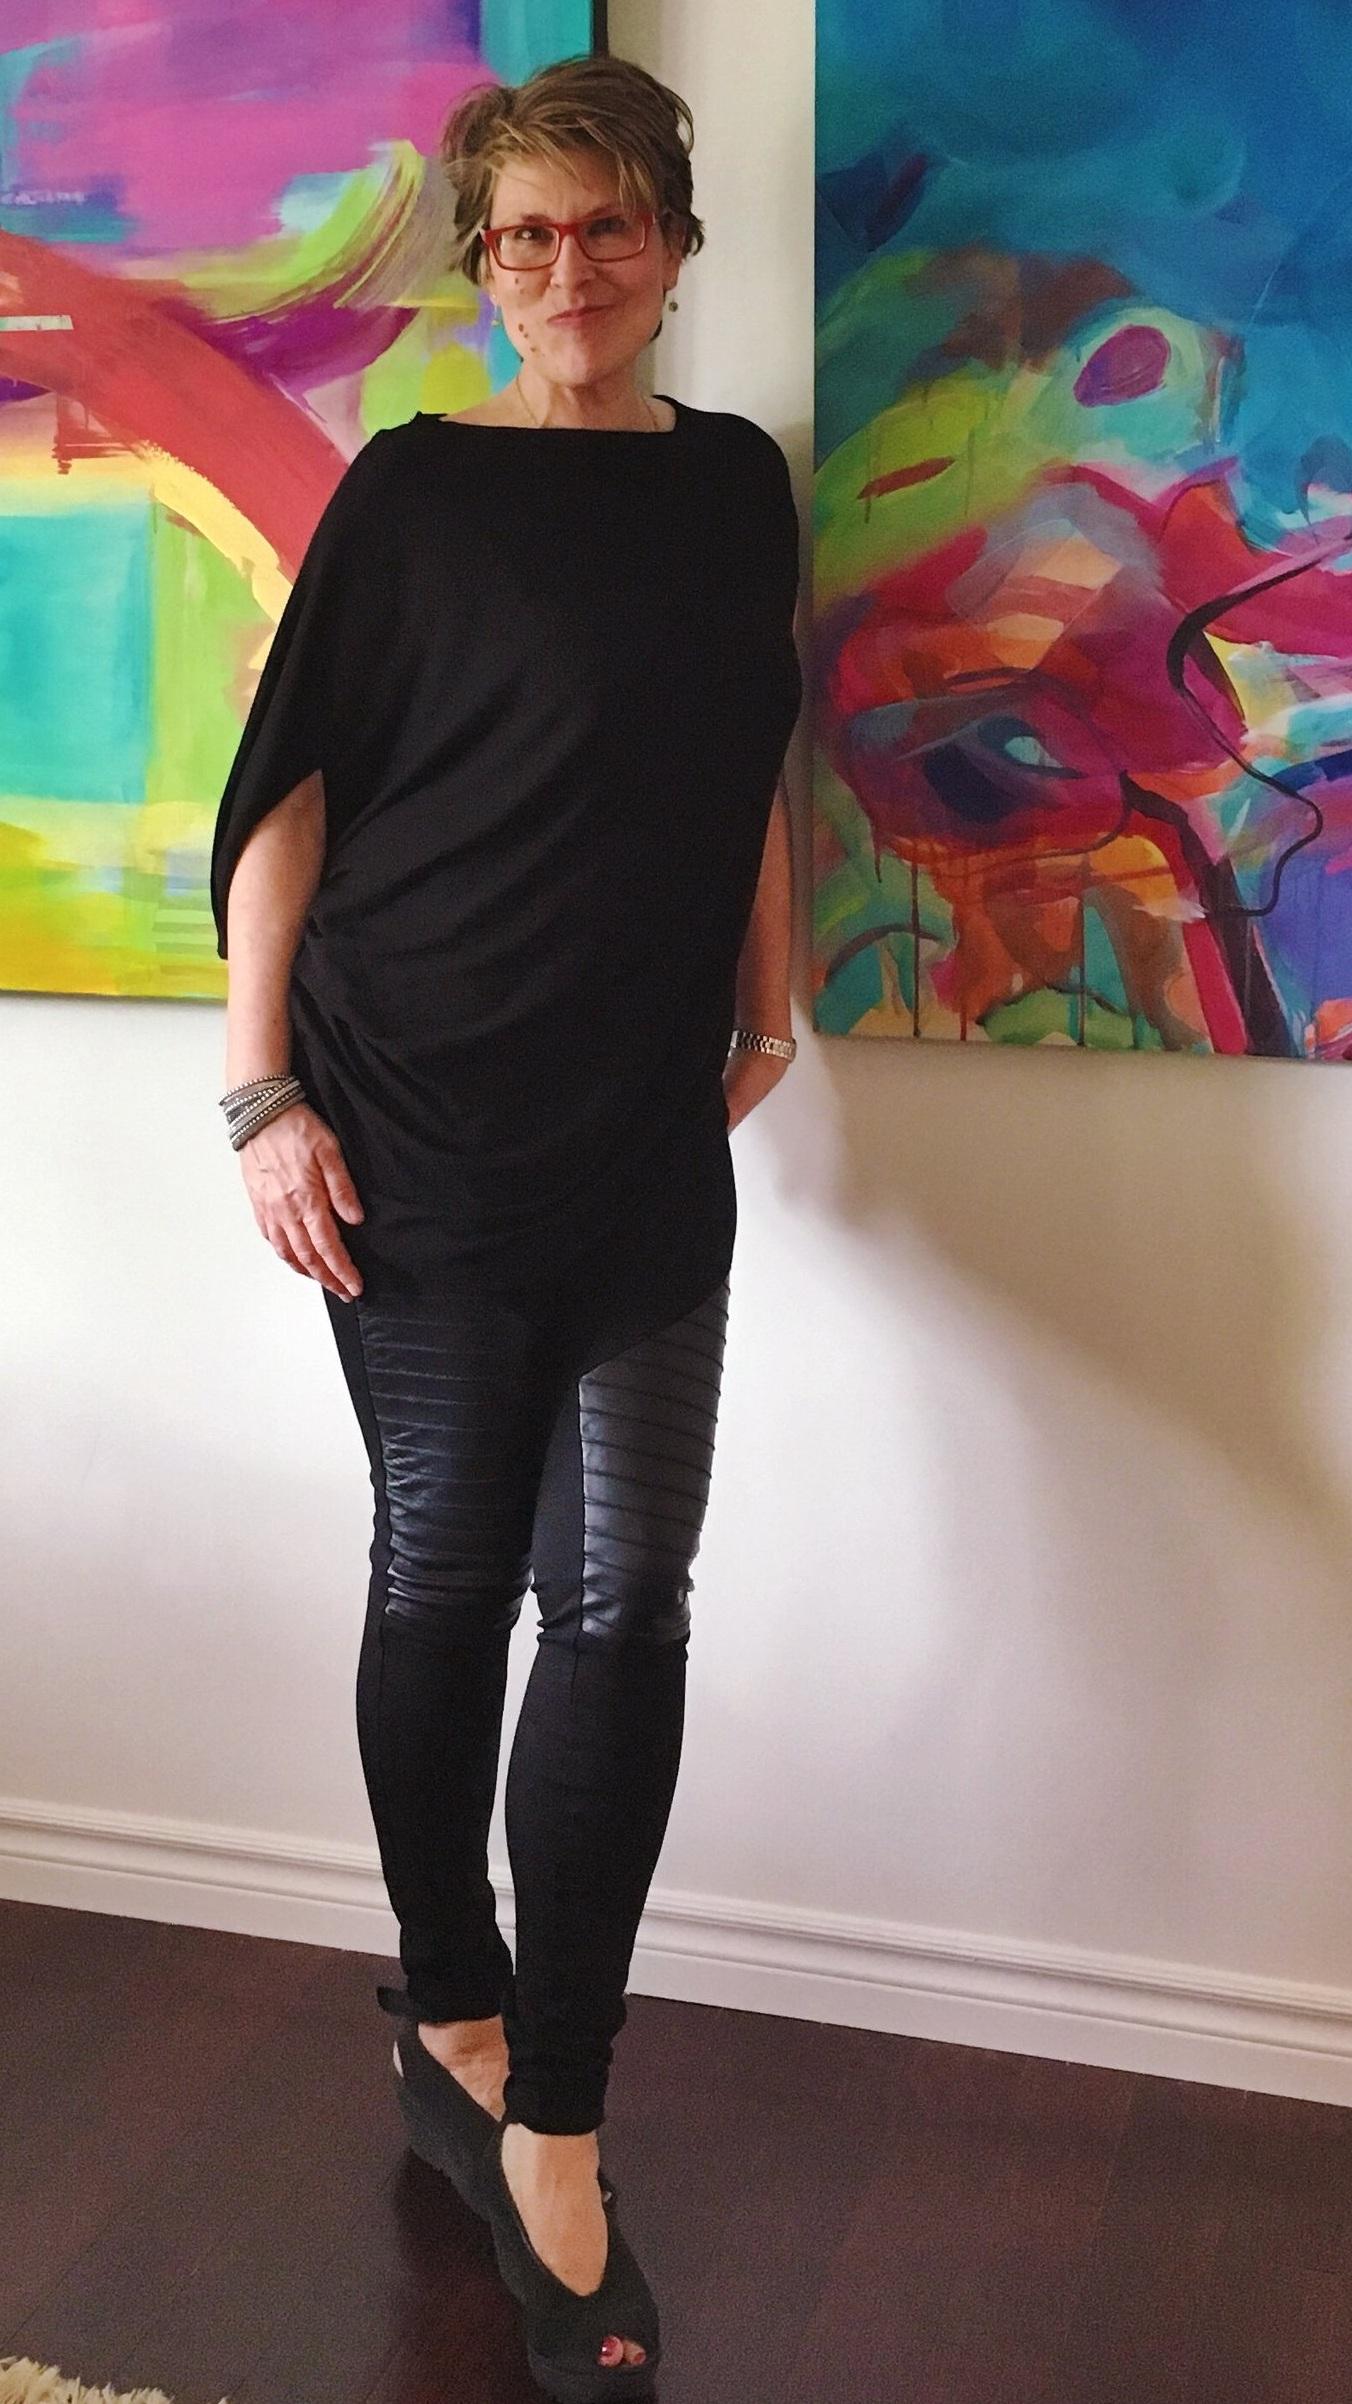 Kati Bujna - fine artist, art decor designer makes original and custom fine art tailored to interior styles. Visit Kati Bujna Fine Art studio and art gallery in Cambridge, Ontario.  Contact the studio manager today .